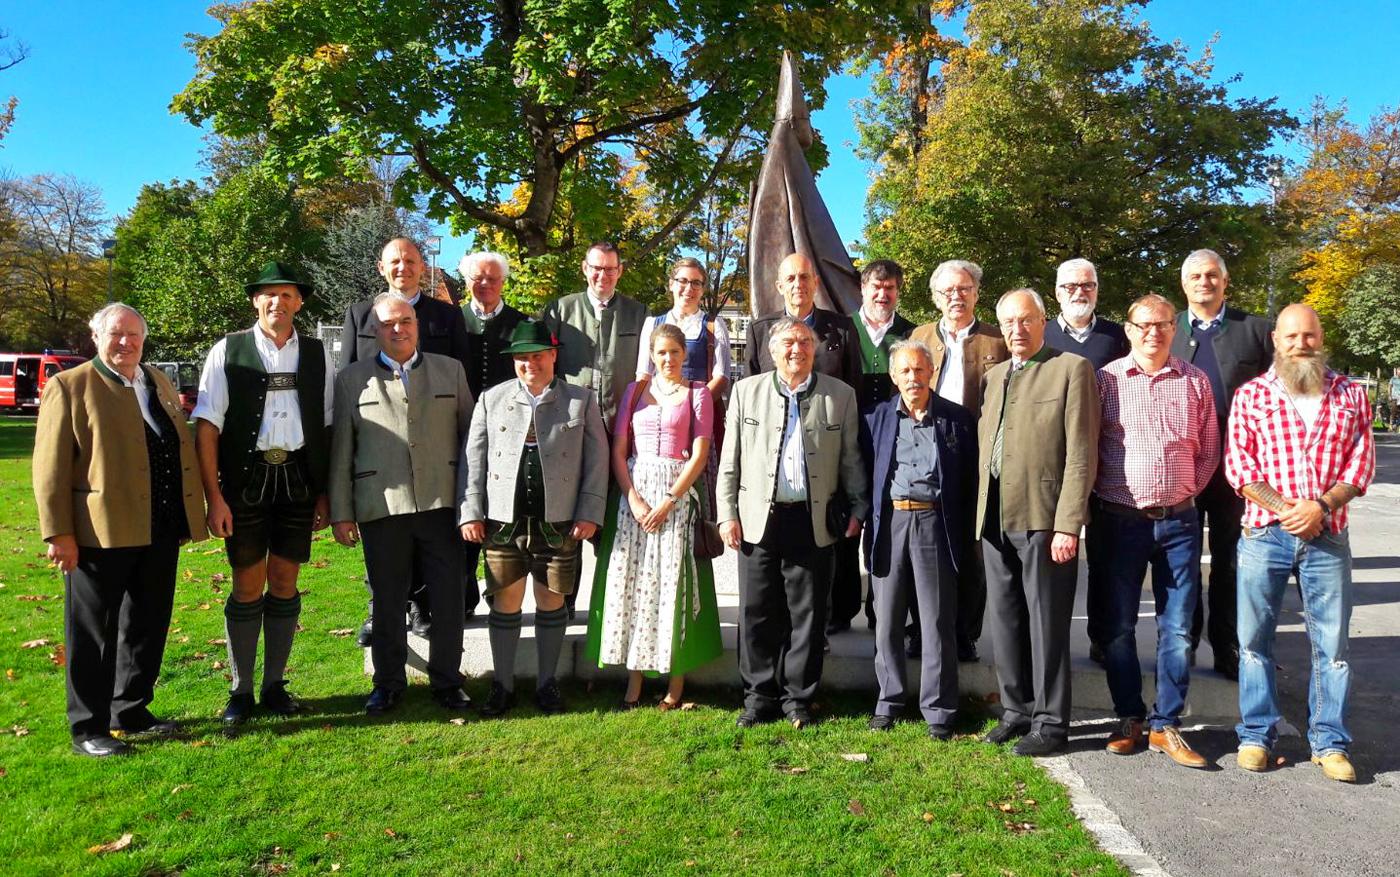 Treffen der Landeskommandanten in Oberbayern